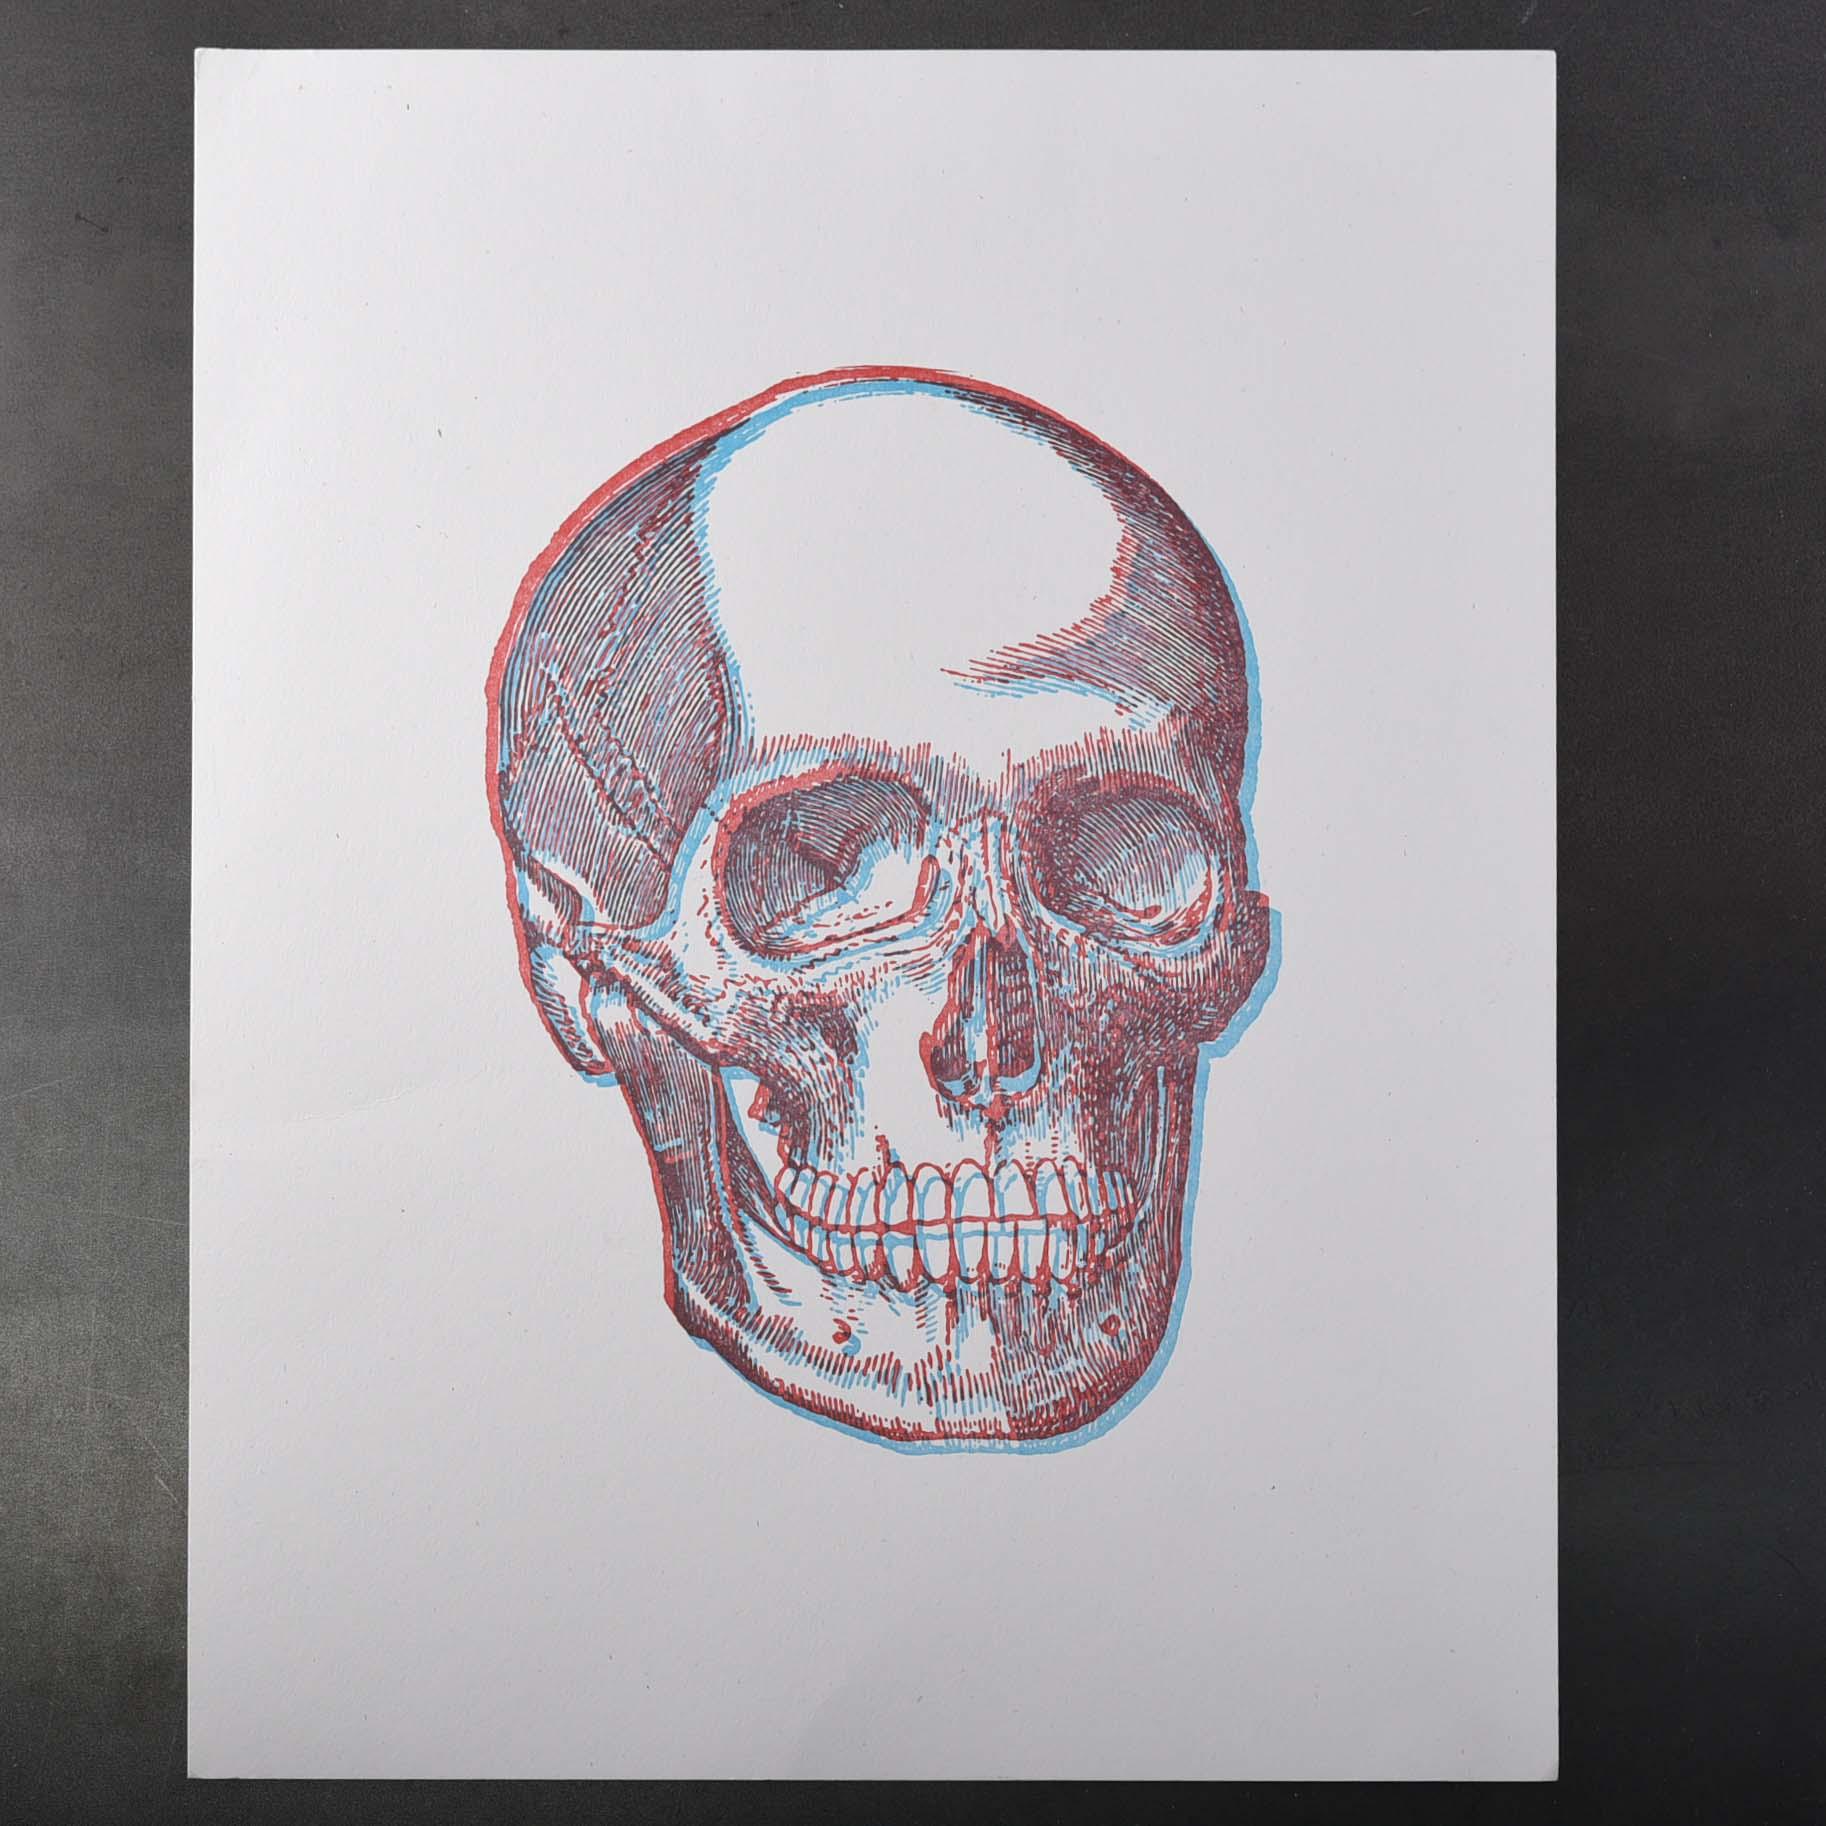 skull overprint wide shot blue and red